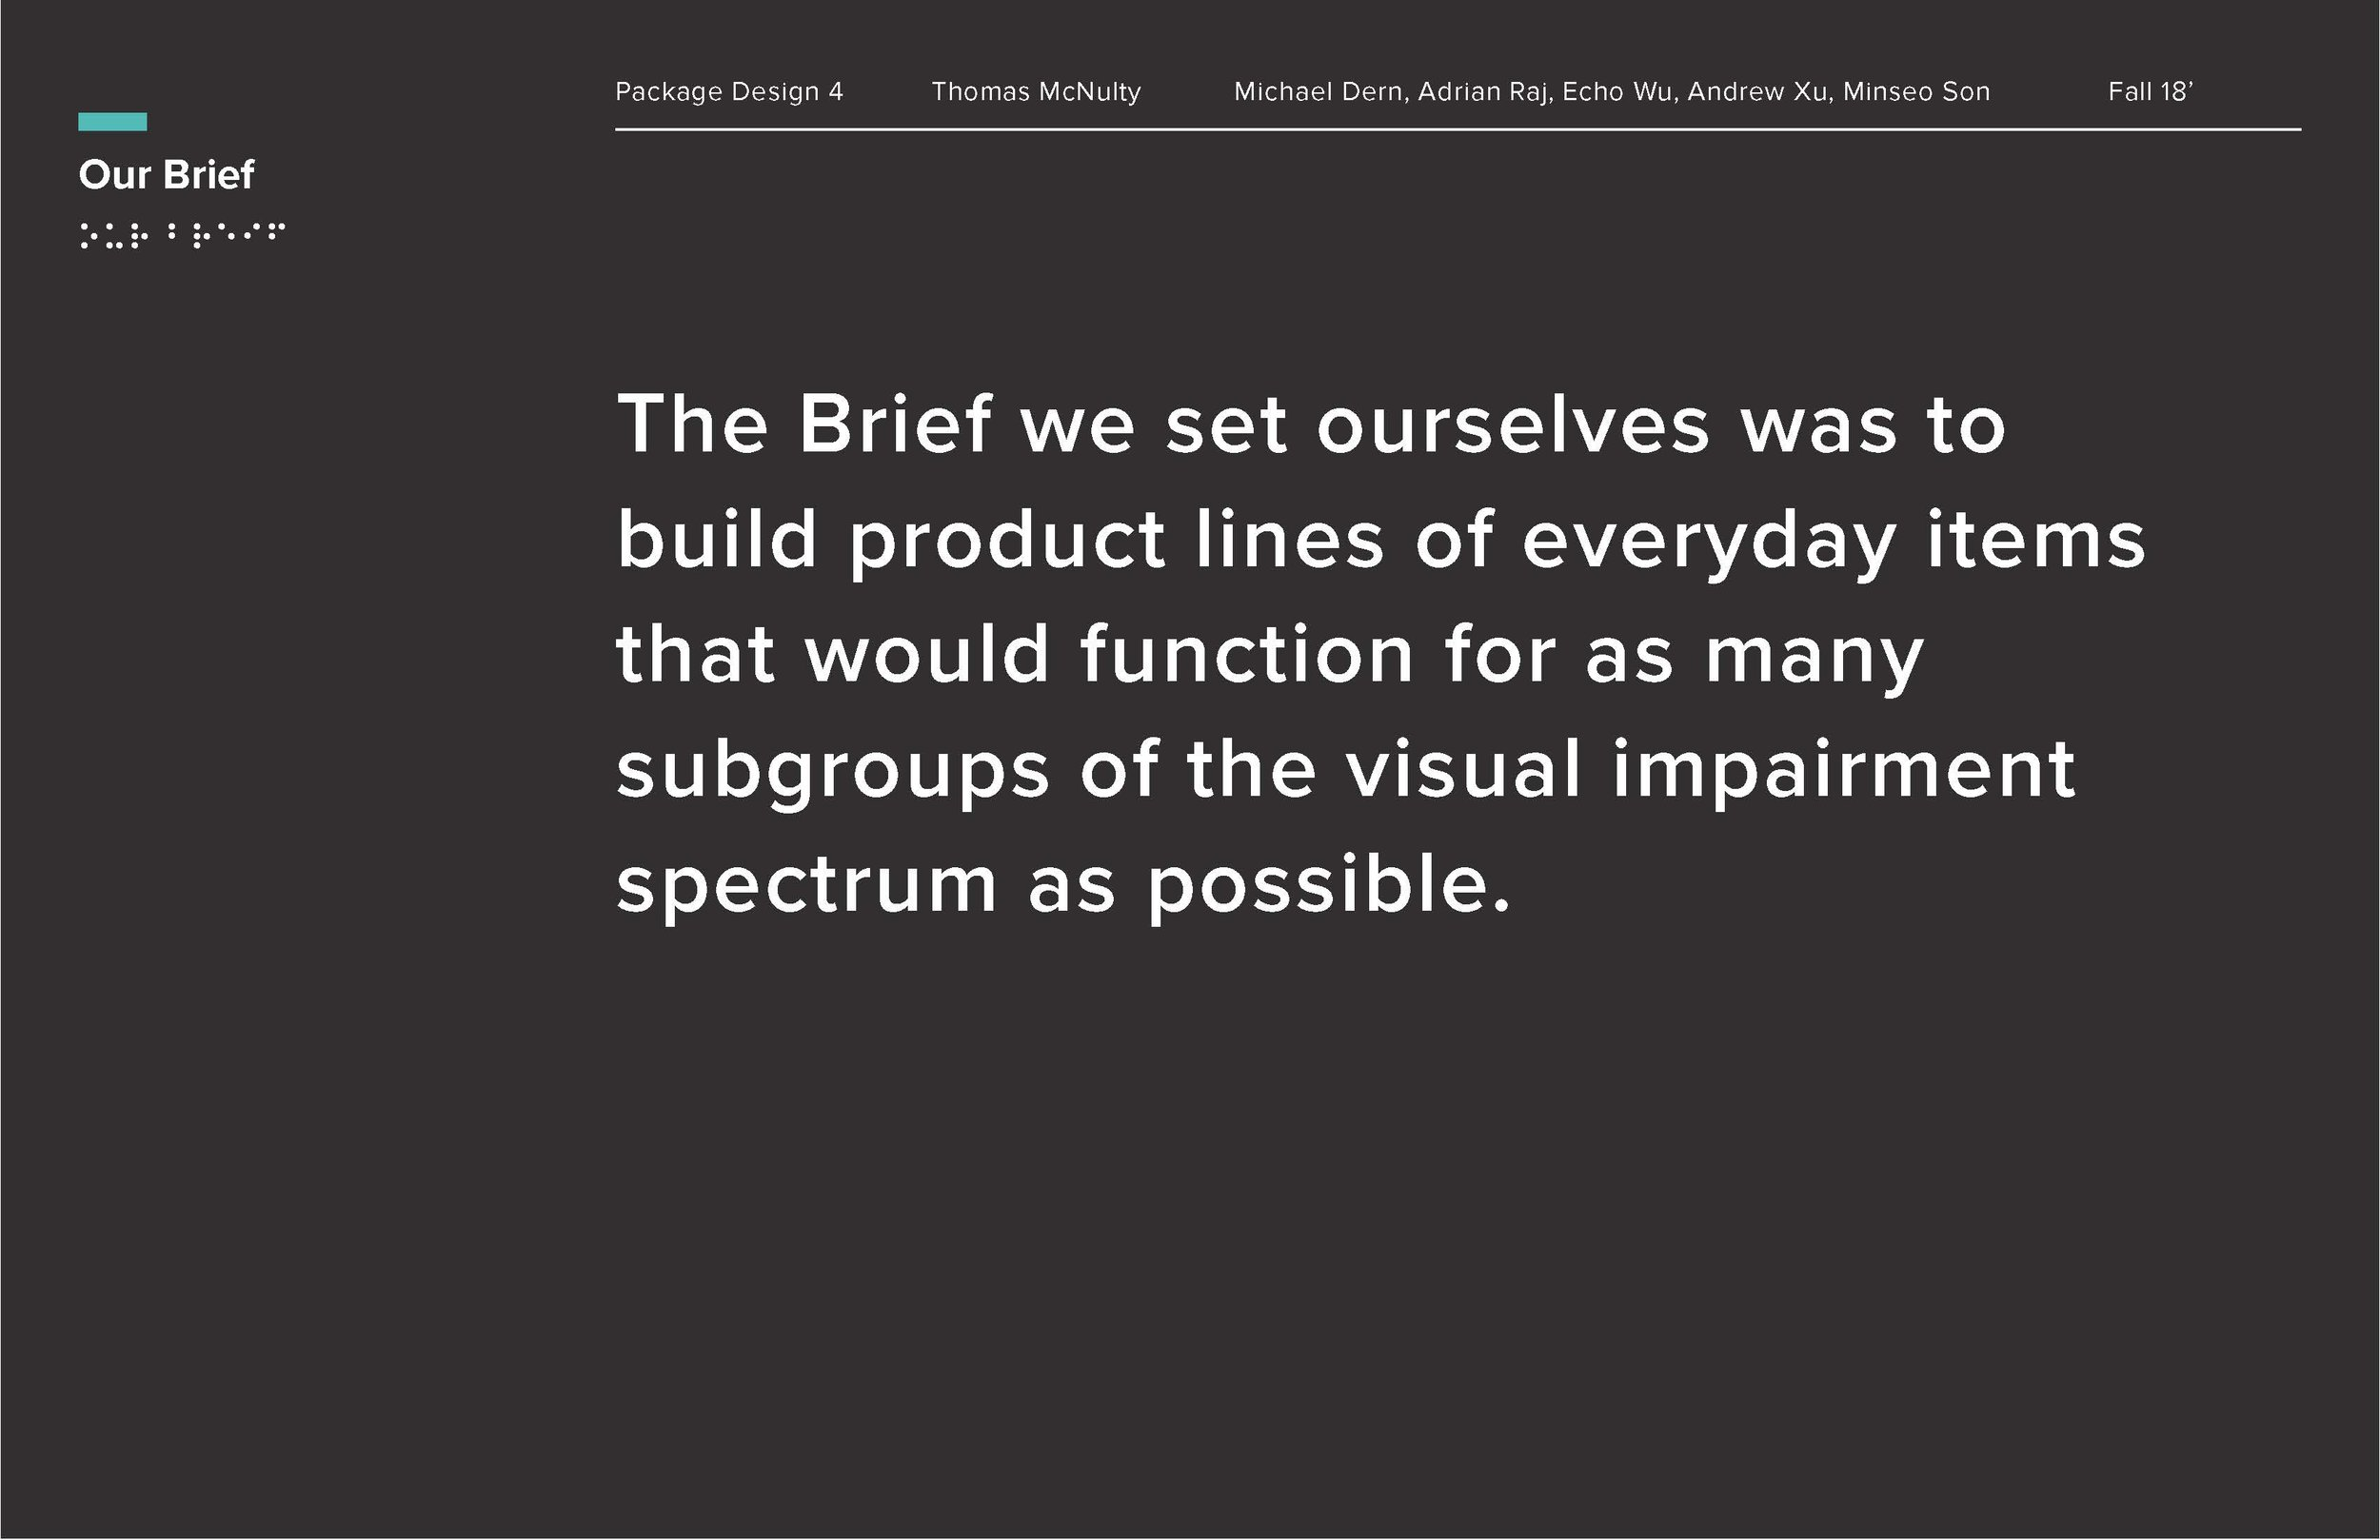 O&M Final Presentation_Page_08.jpg